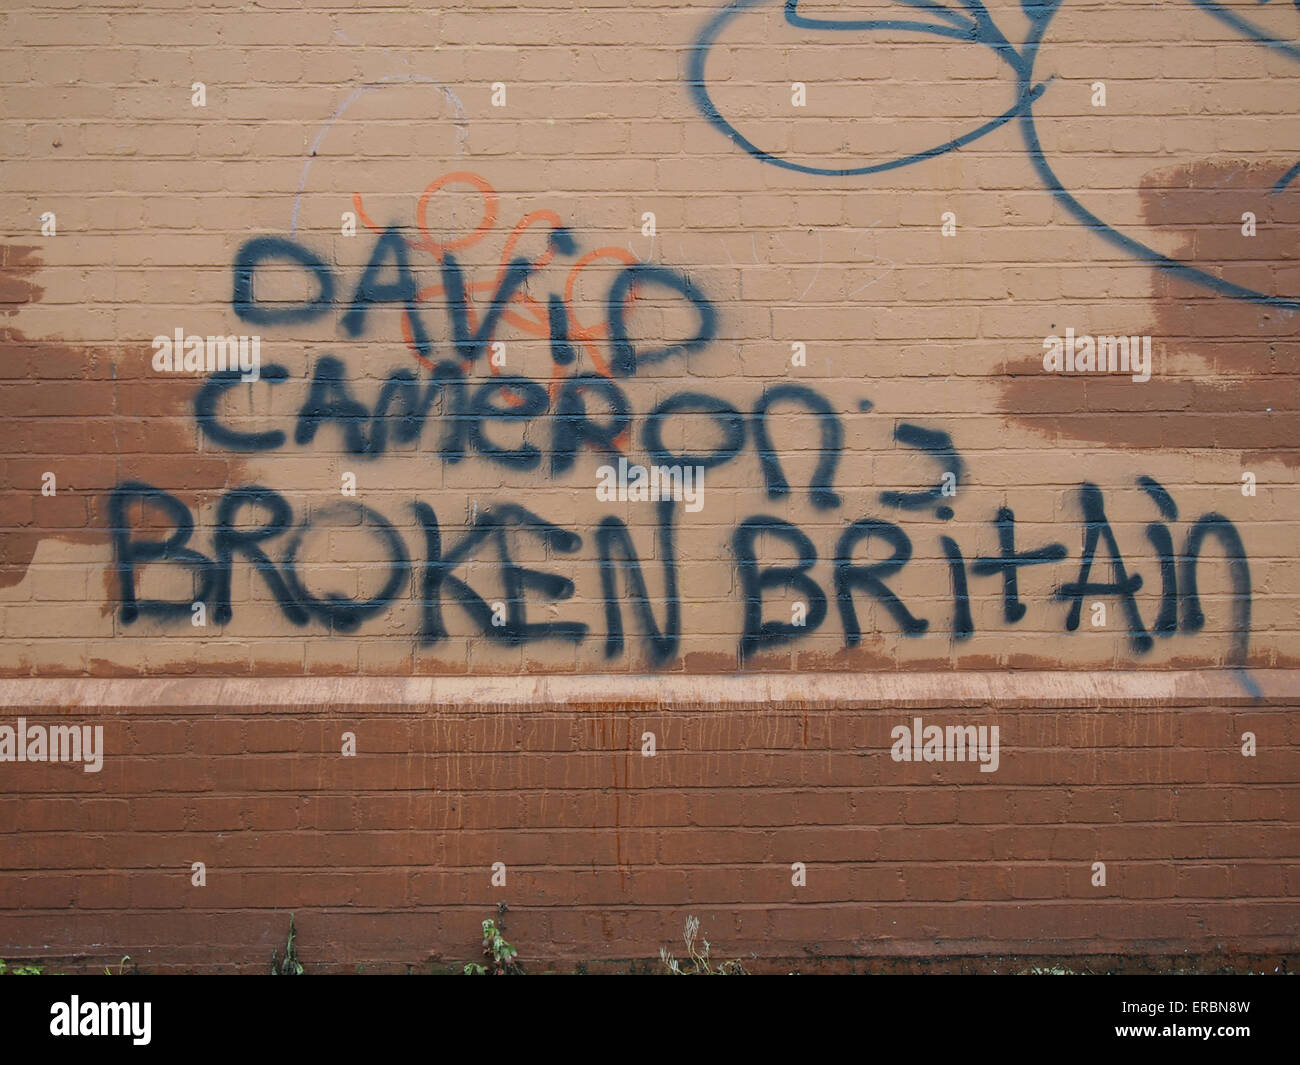 political-graffiti-spray-painted-on-a-wall-proclaiming-david-camerons-ERBN8W.jpg